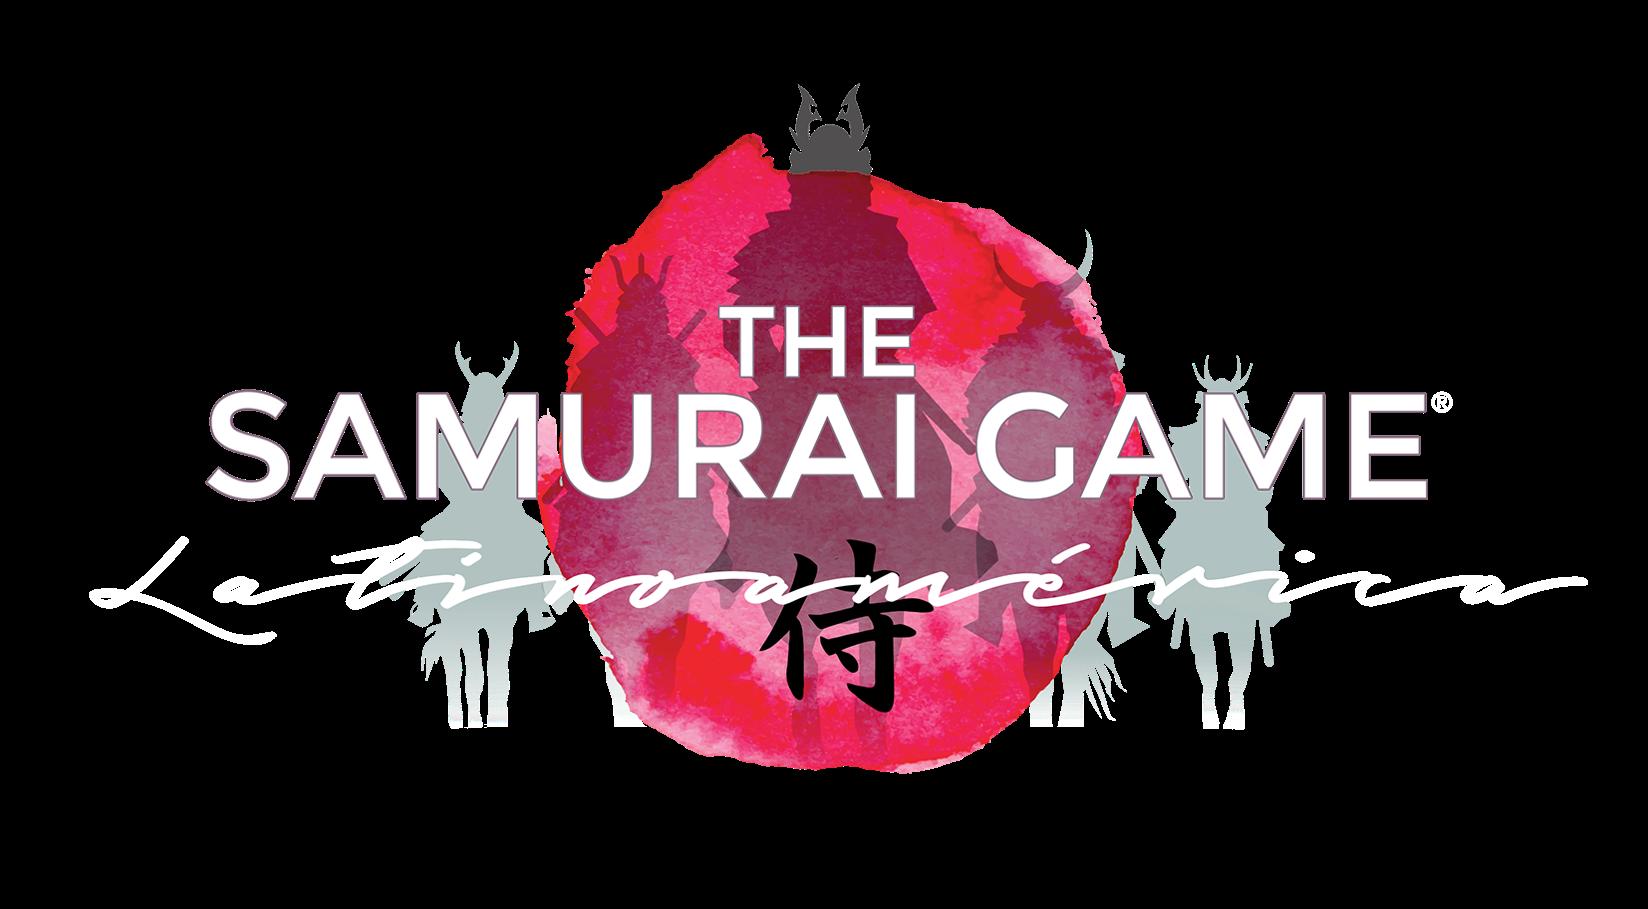 SAMURAI GAME ORIENTAR